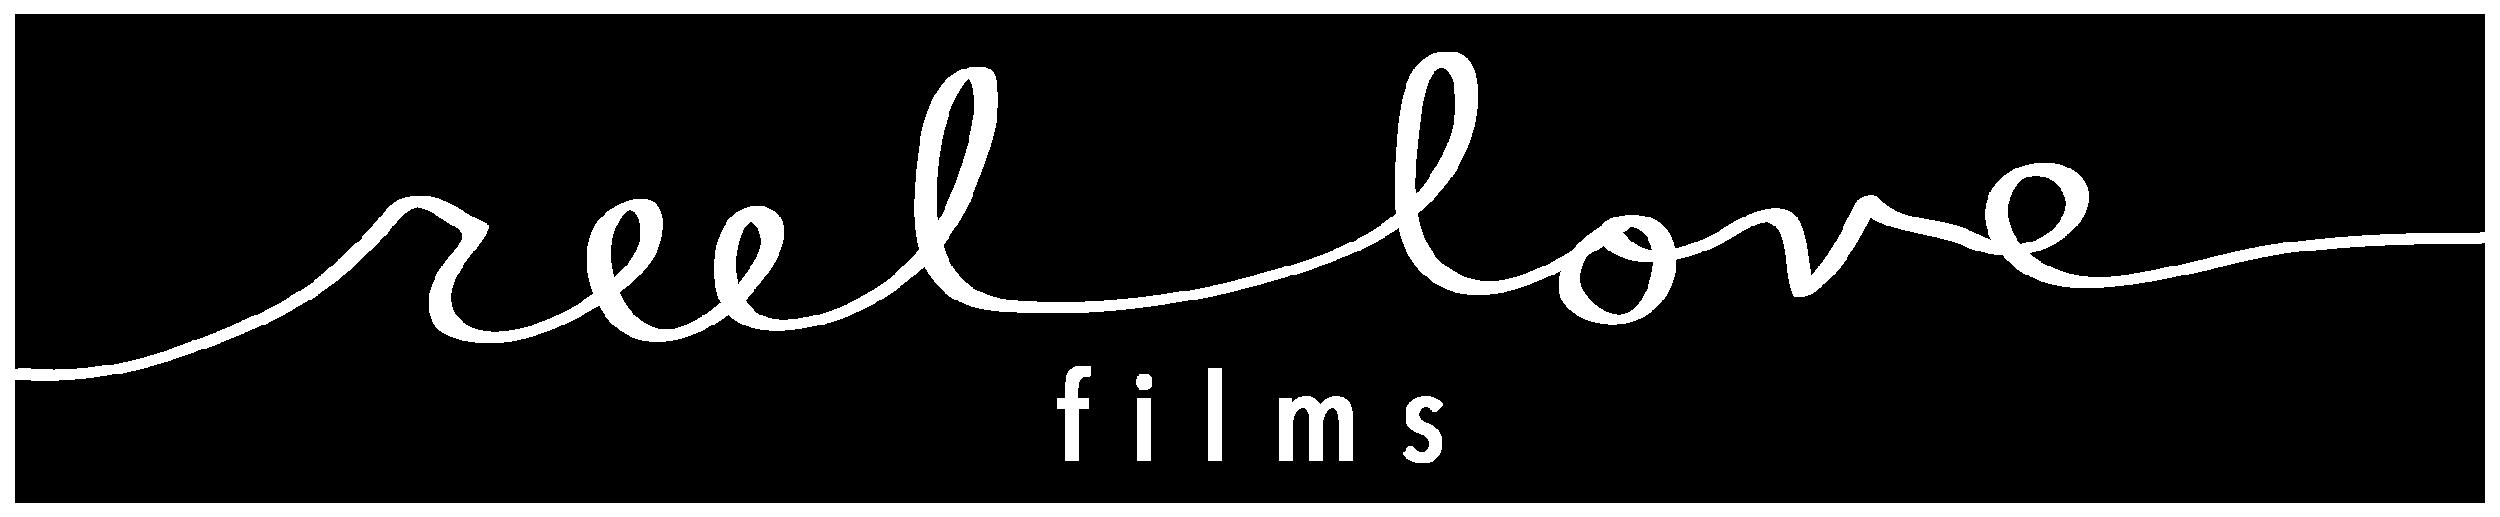 LineLogoWhite-RGB.png